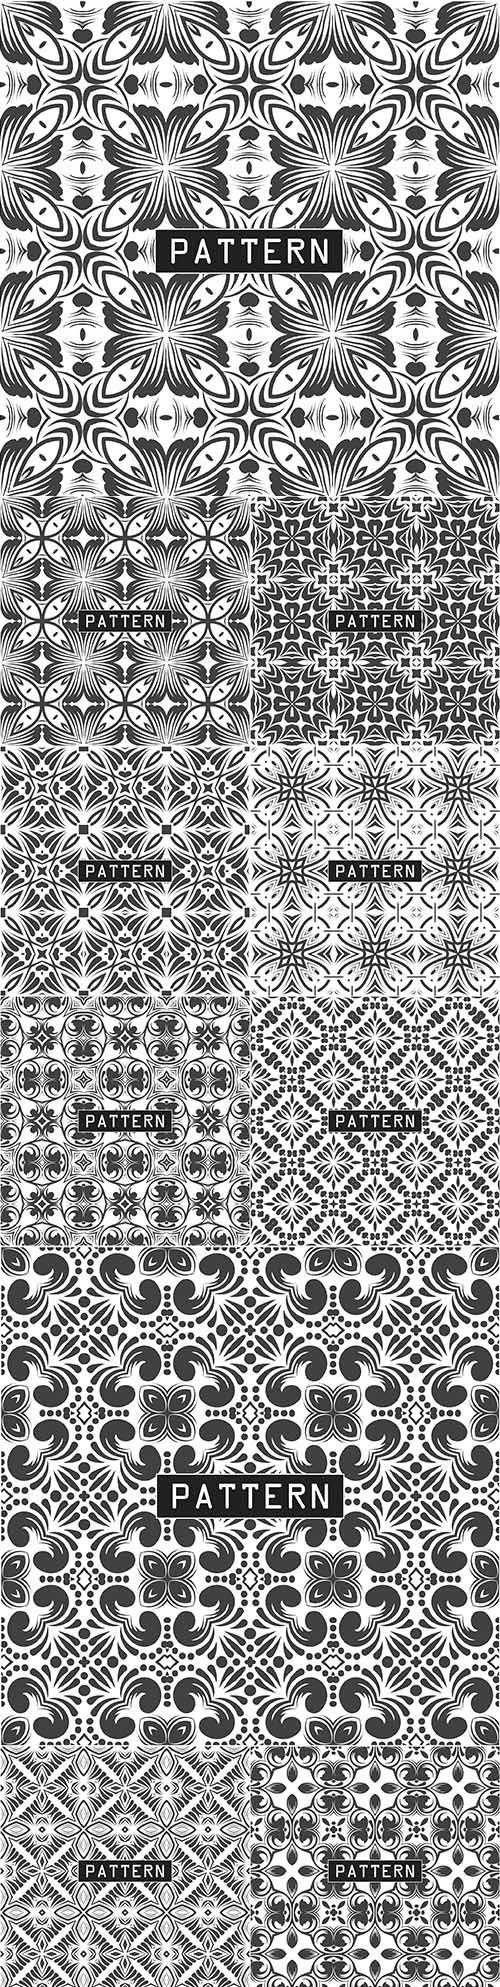 Decorative black and white seamless design pattern